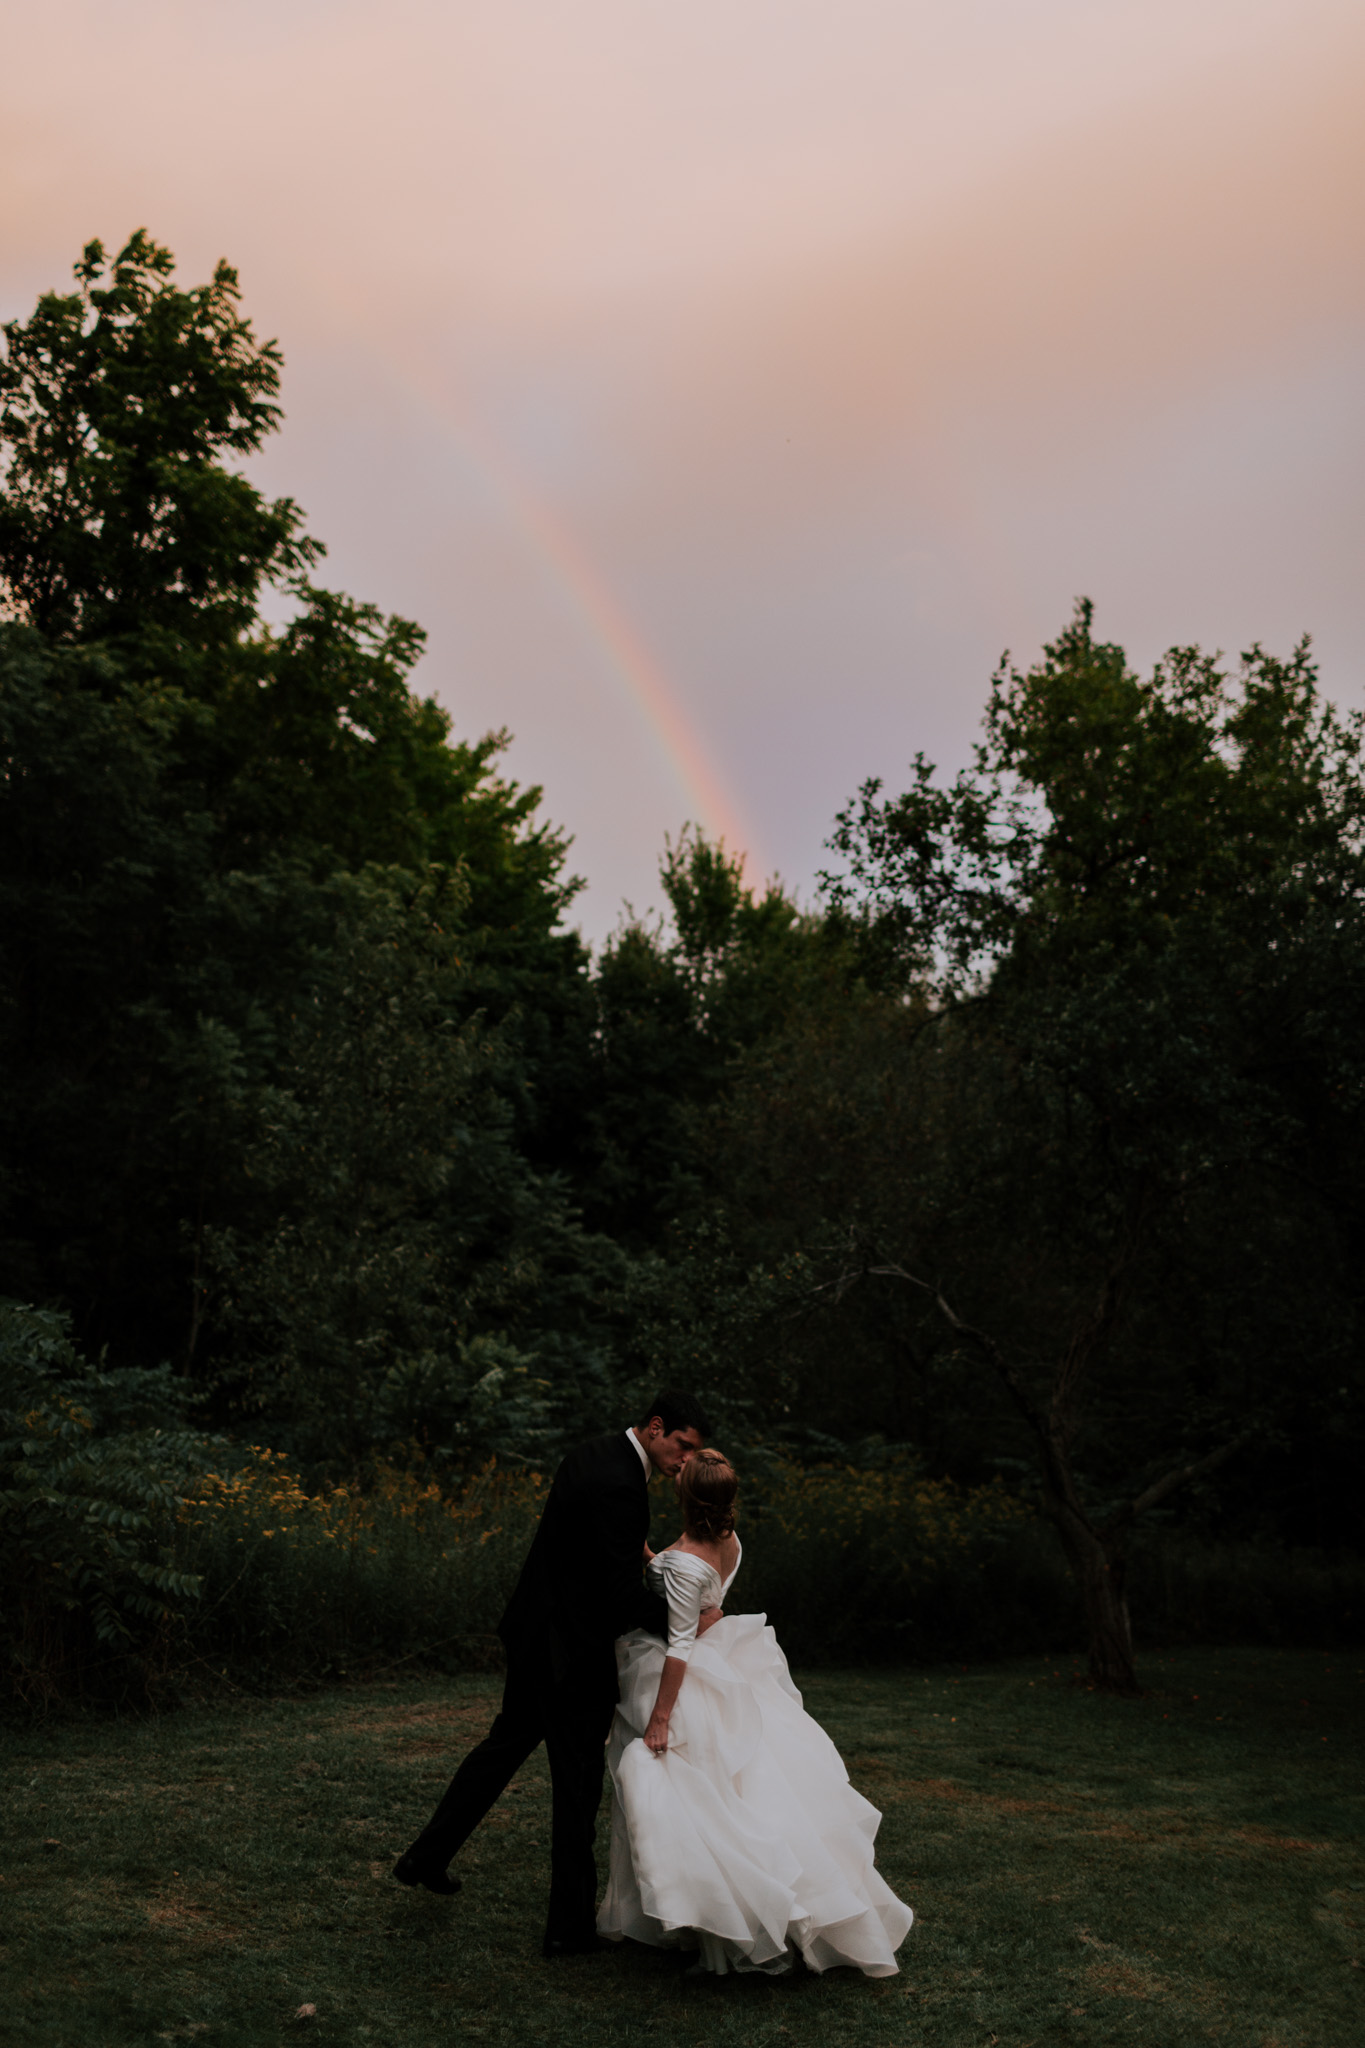 MillCreek-Wilde-Wedding-Barn-Michigan-Eliza-Eric-Vafa-Photo1182.jpg